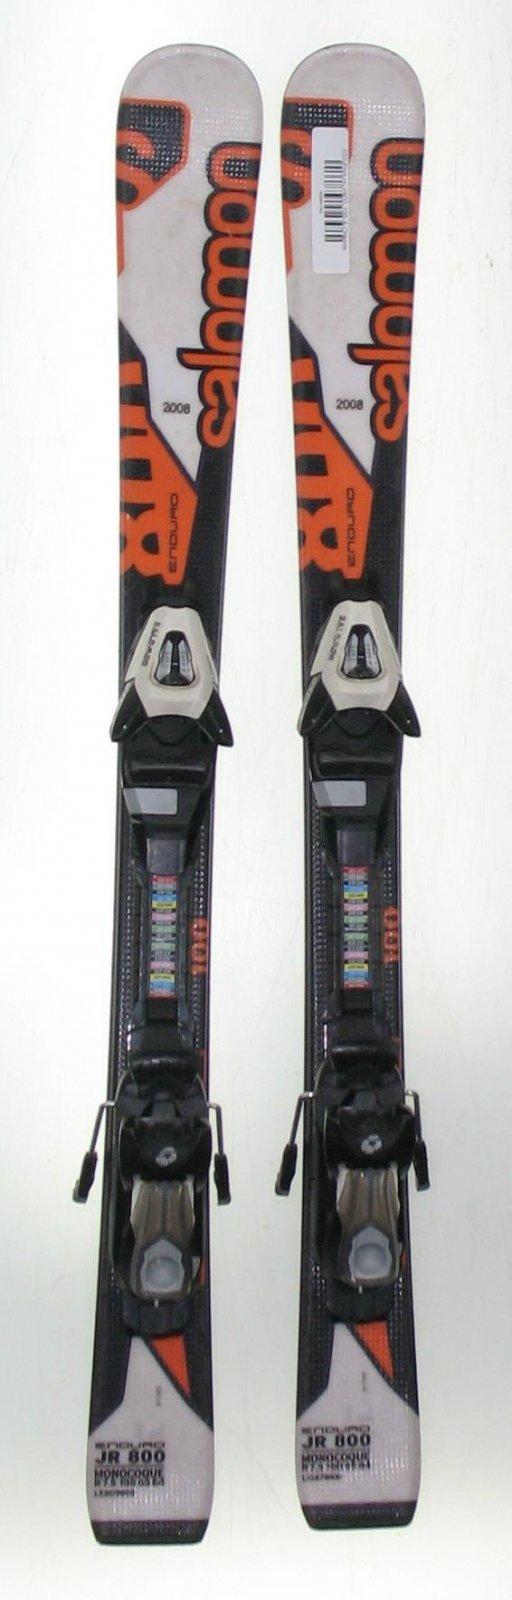 Salomon Enduro Jr. 800 XS + C5